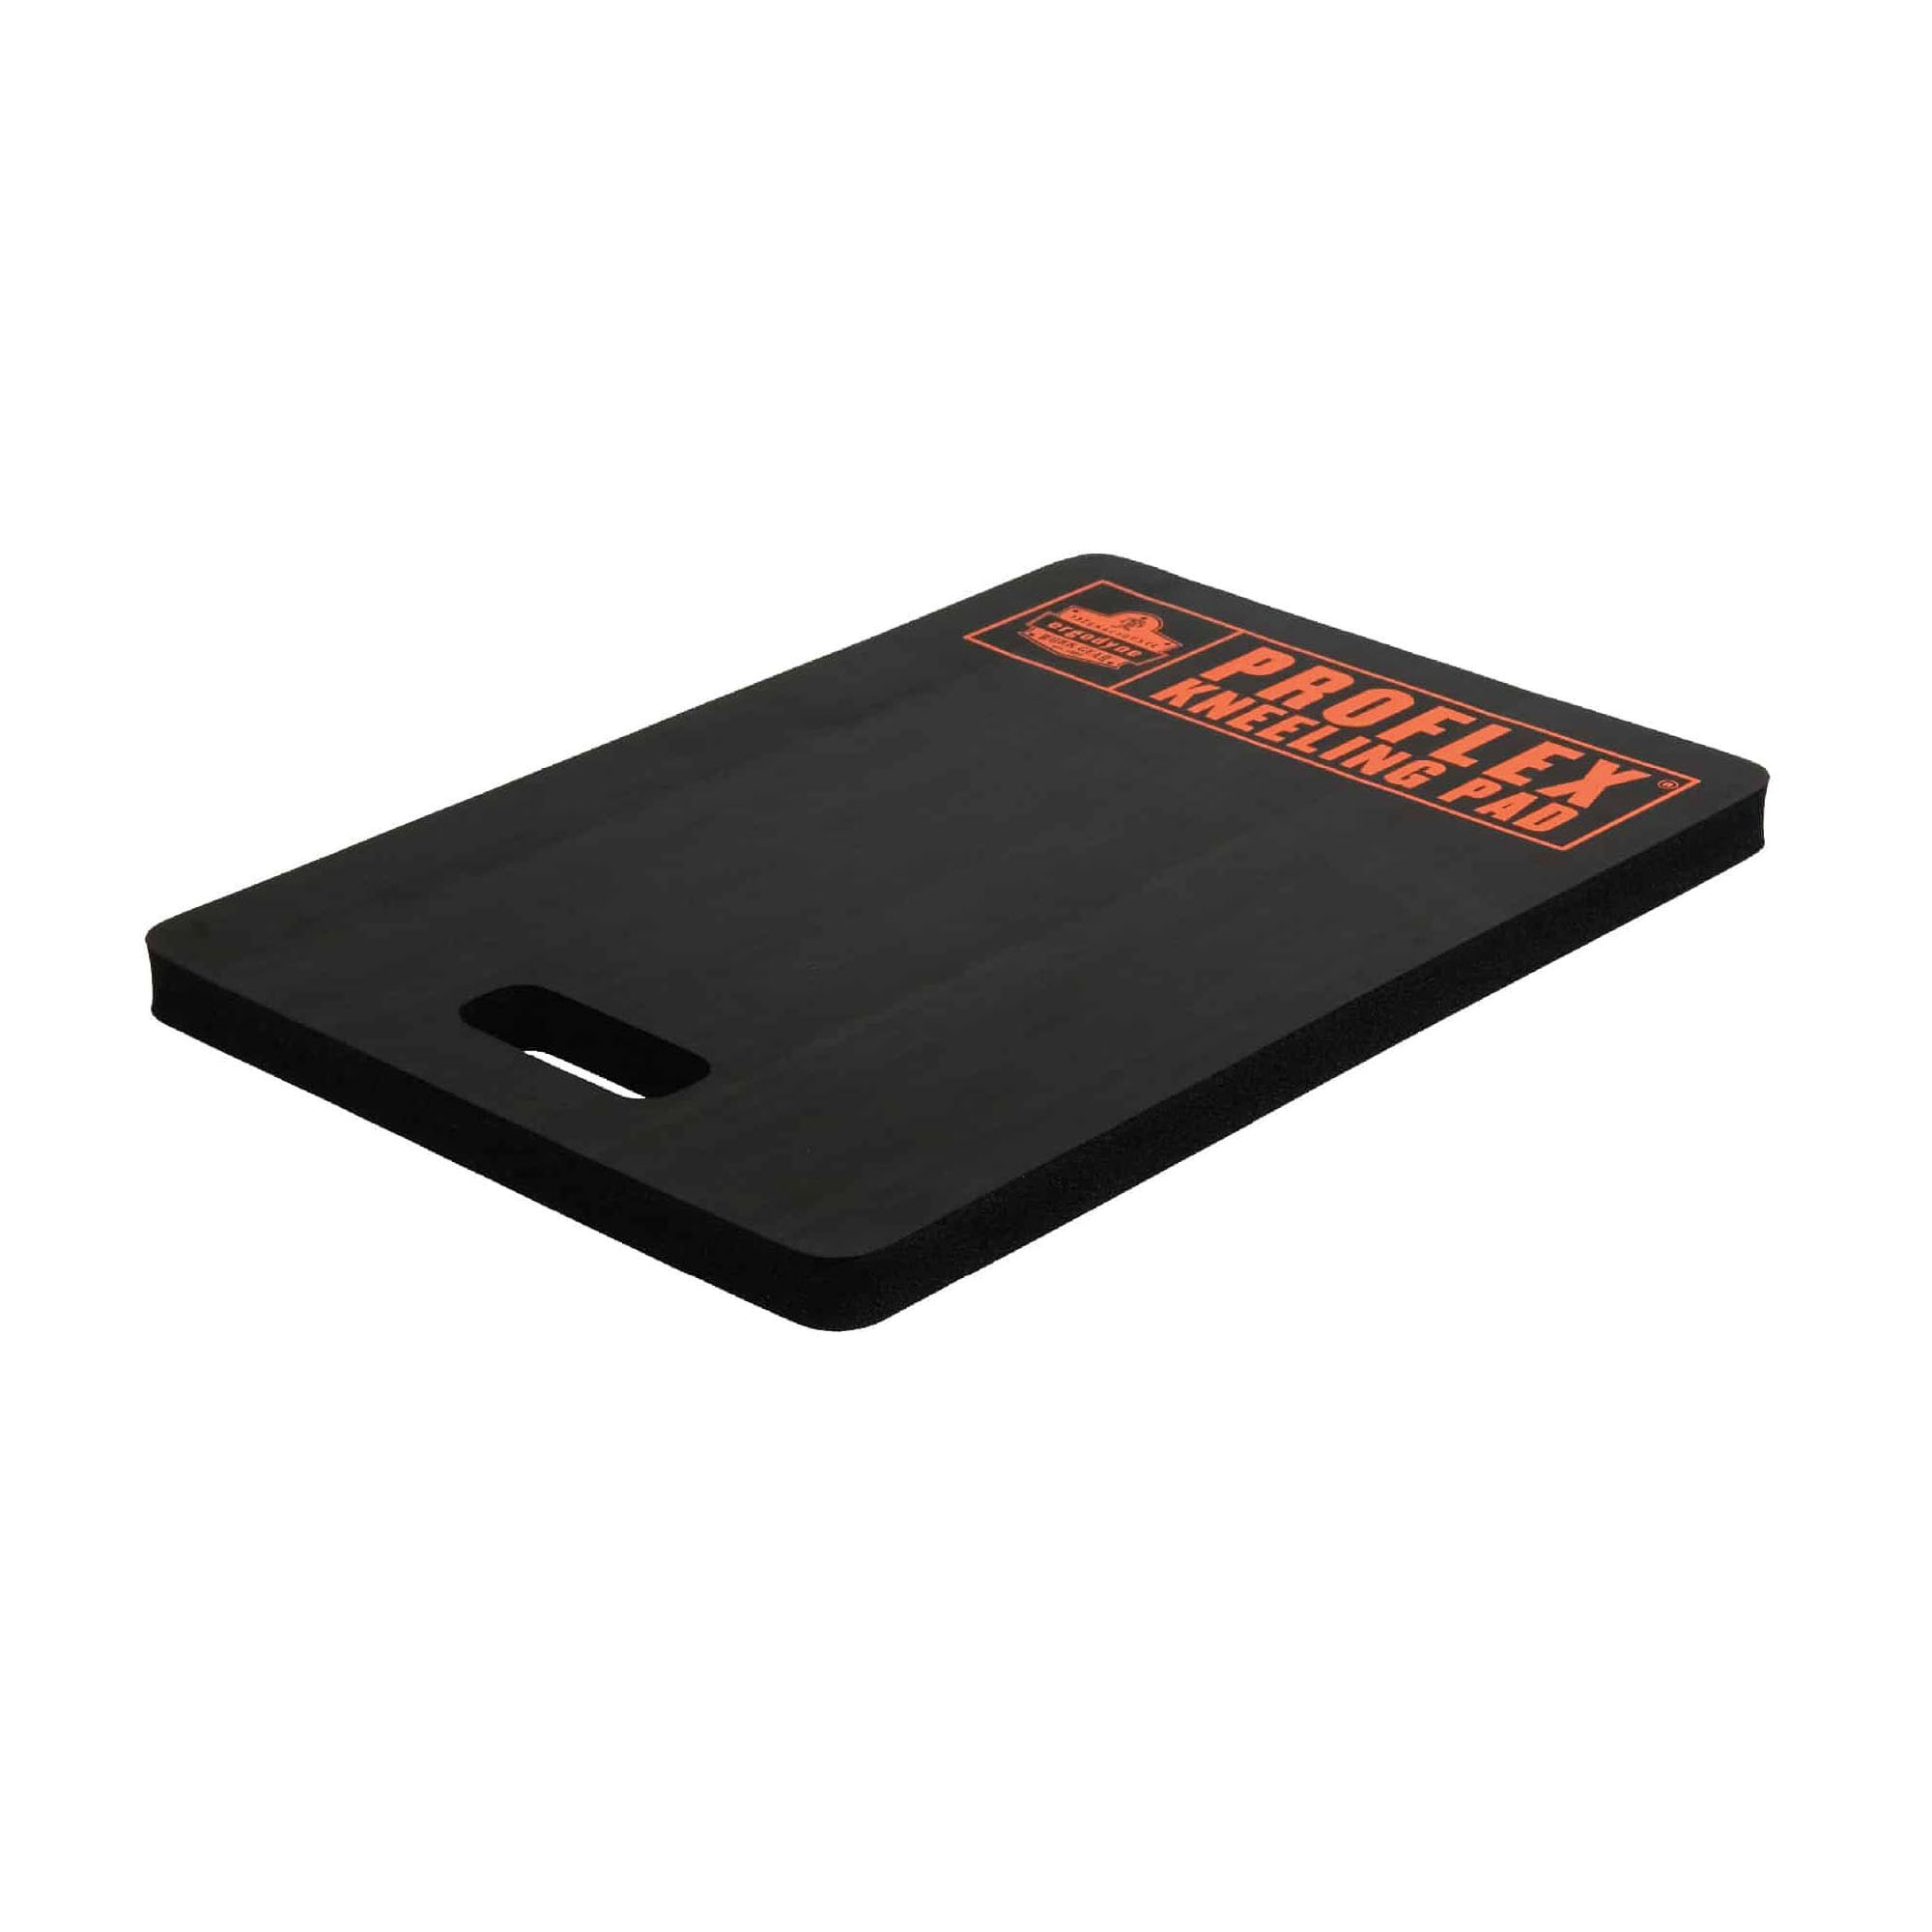 ProFlex® 18380 Standard Kneeling Pad, 21 in L x 14 in W x 1 in THK, Closed Cell Foam, Black